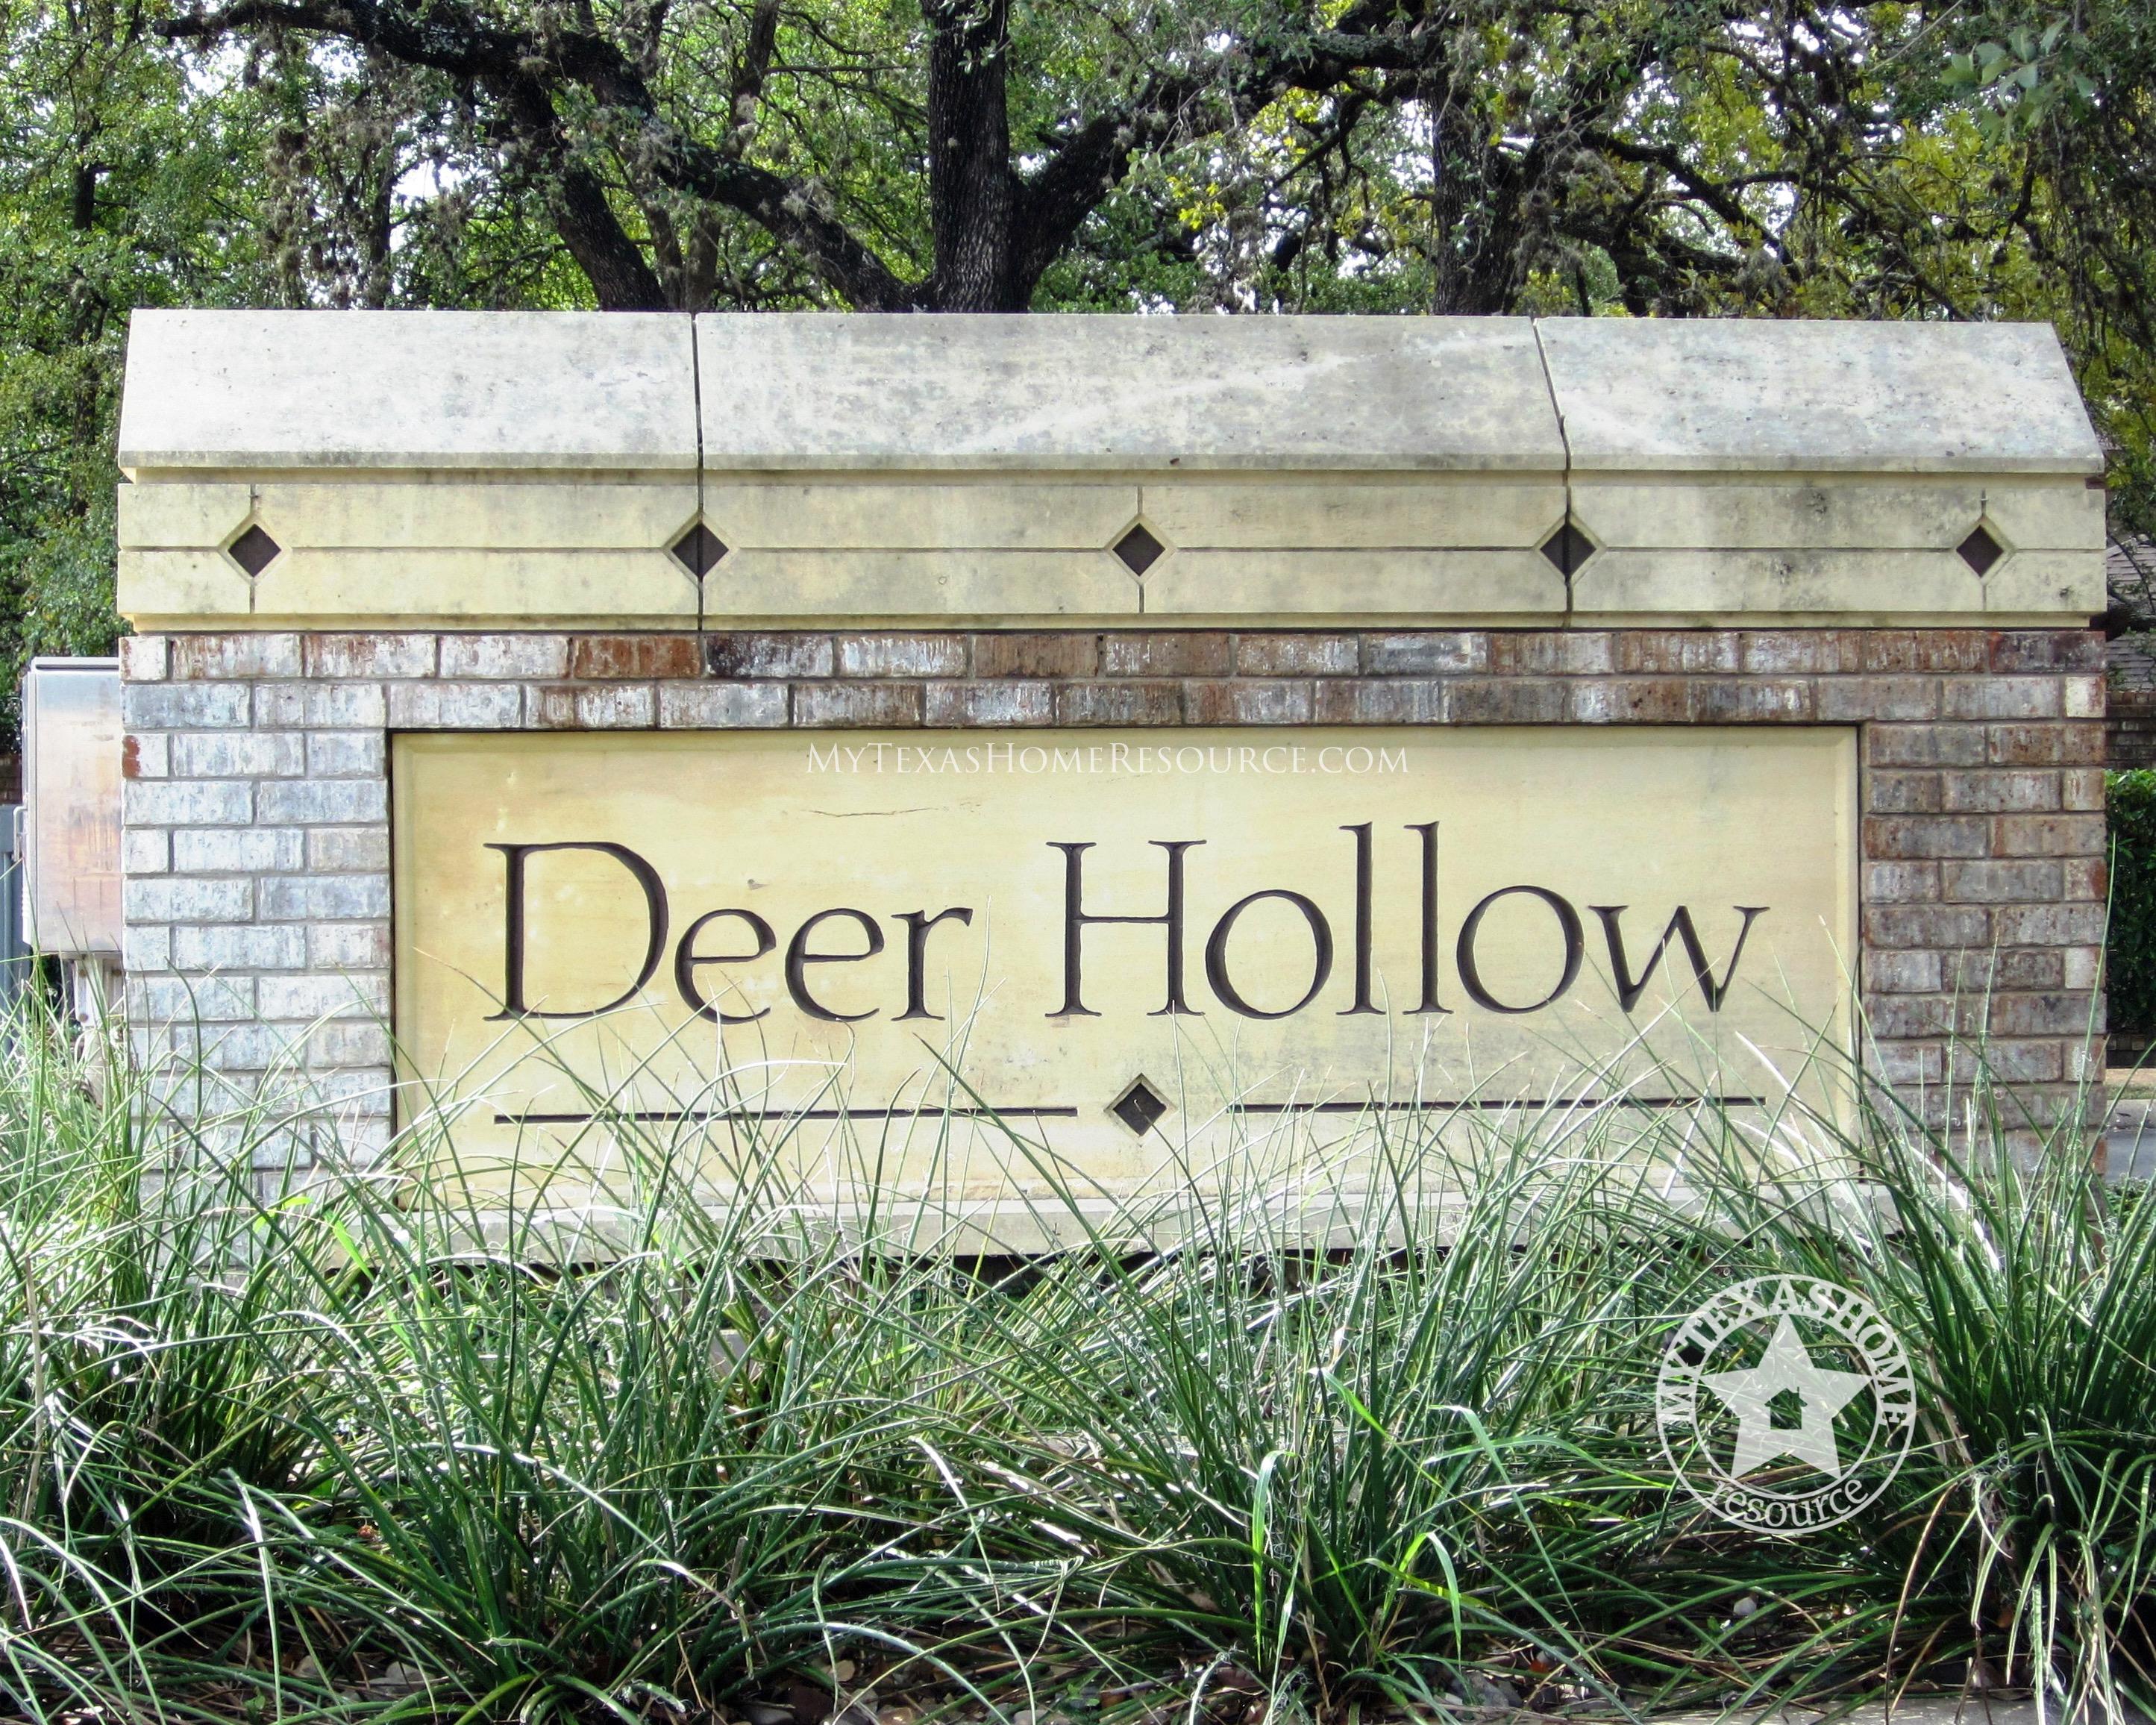 Deer Hollow Community